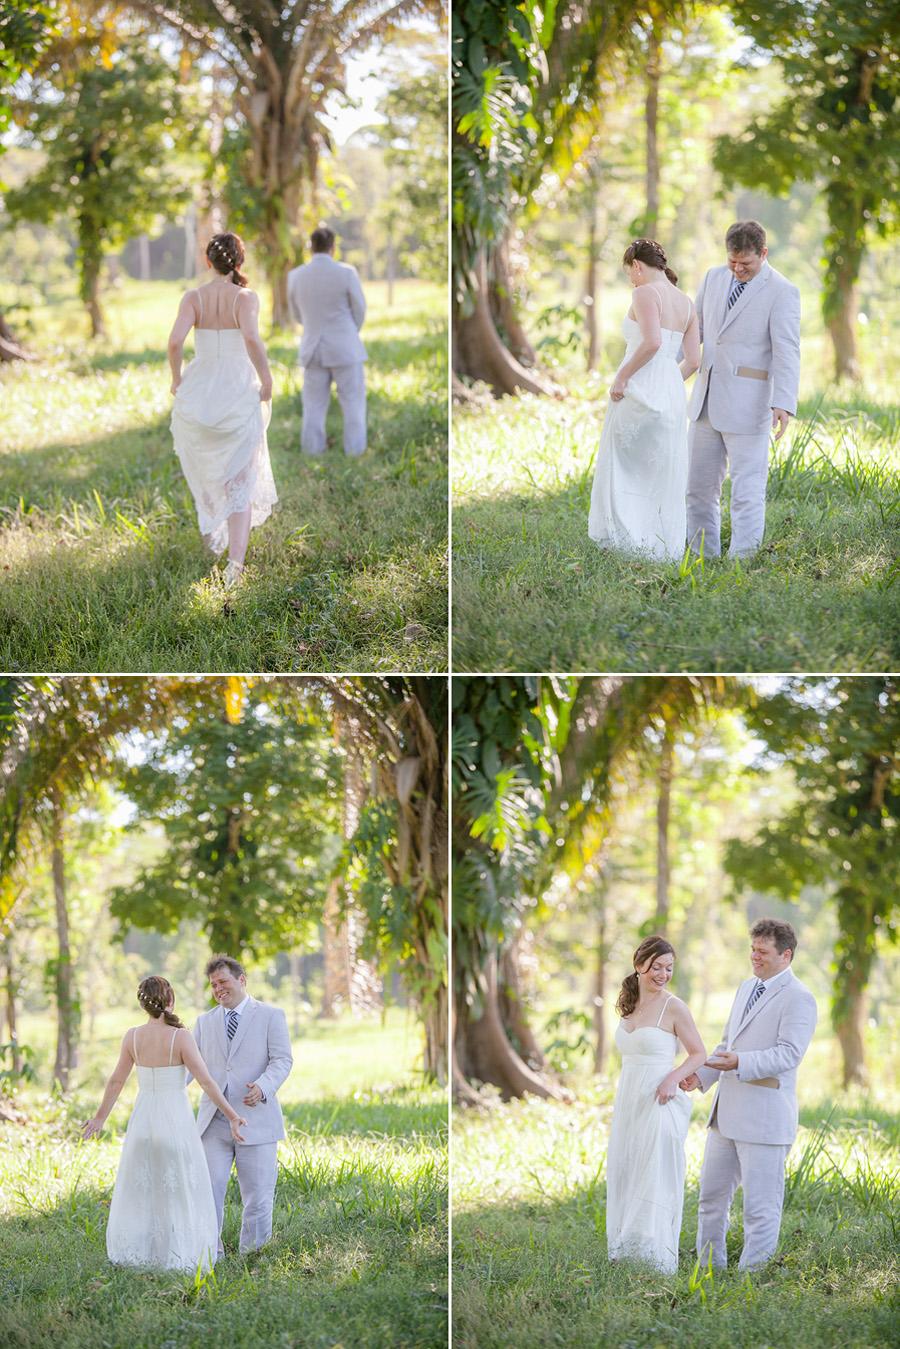 Belcampo Belize Wedding Photography-39.jpg